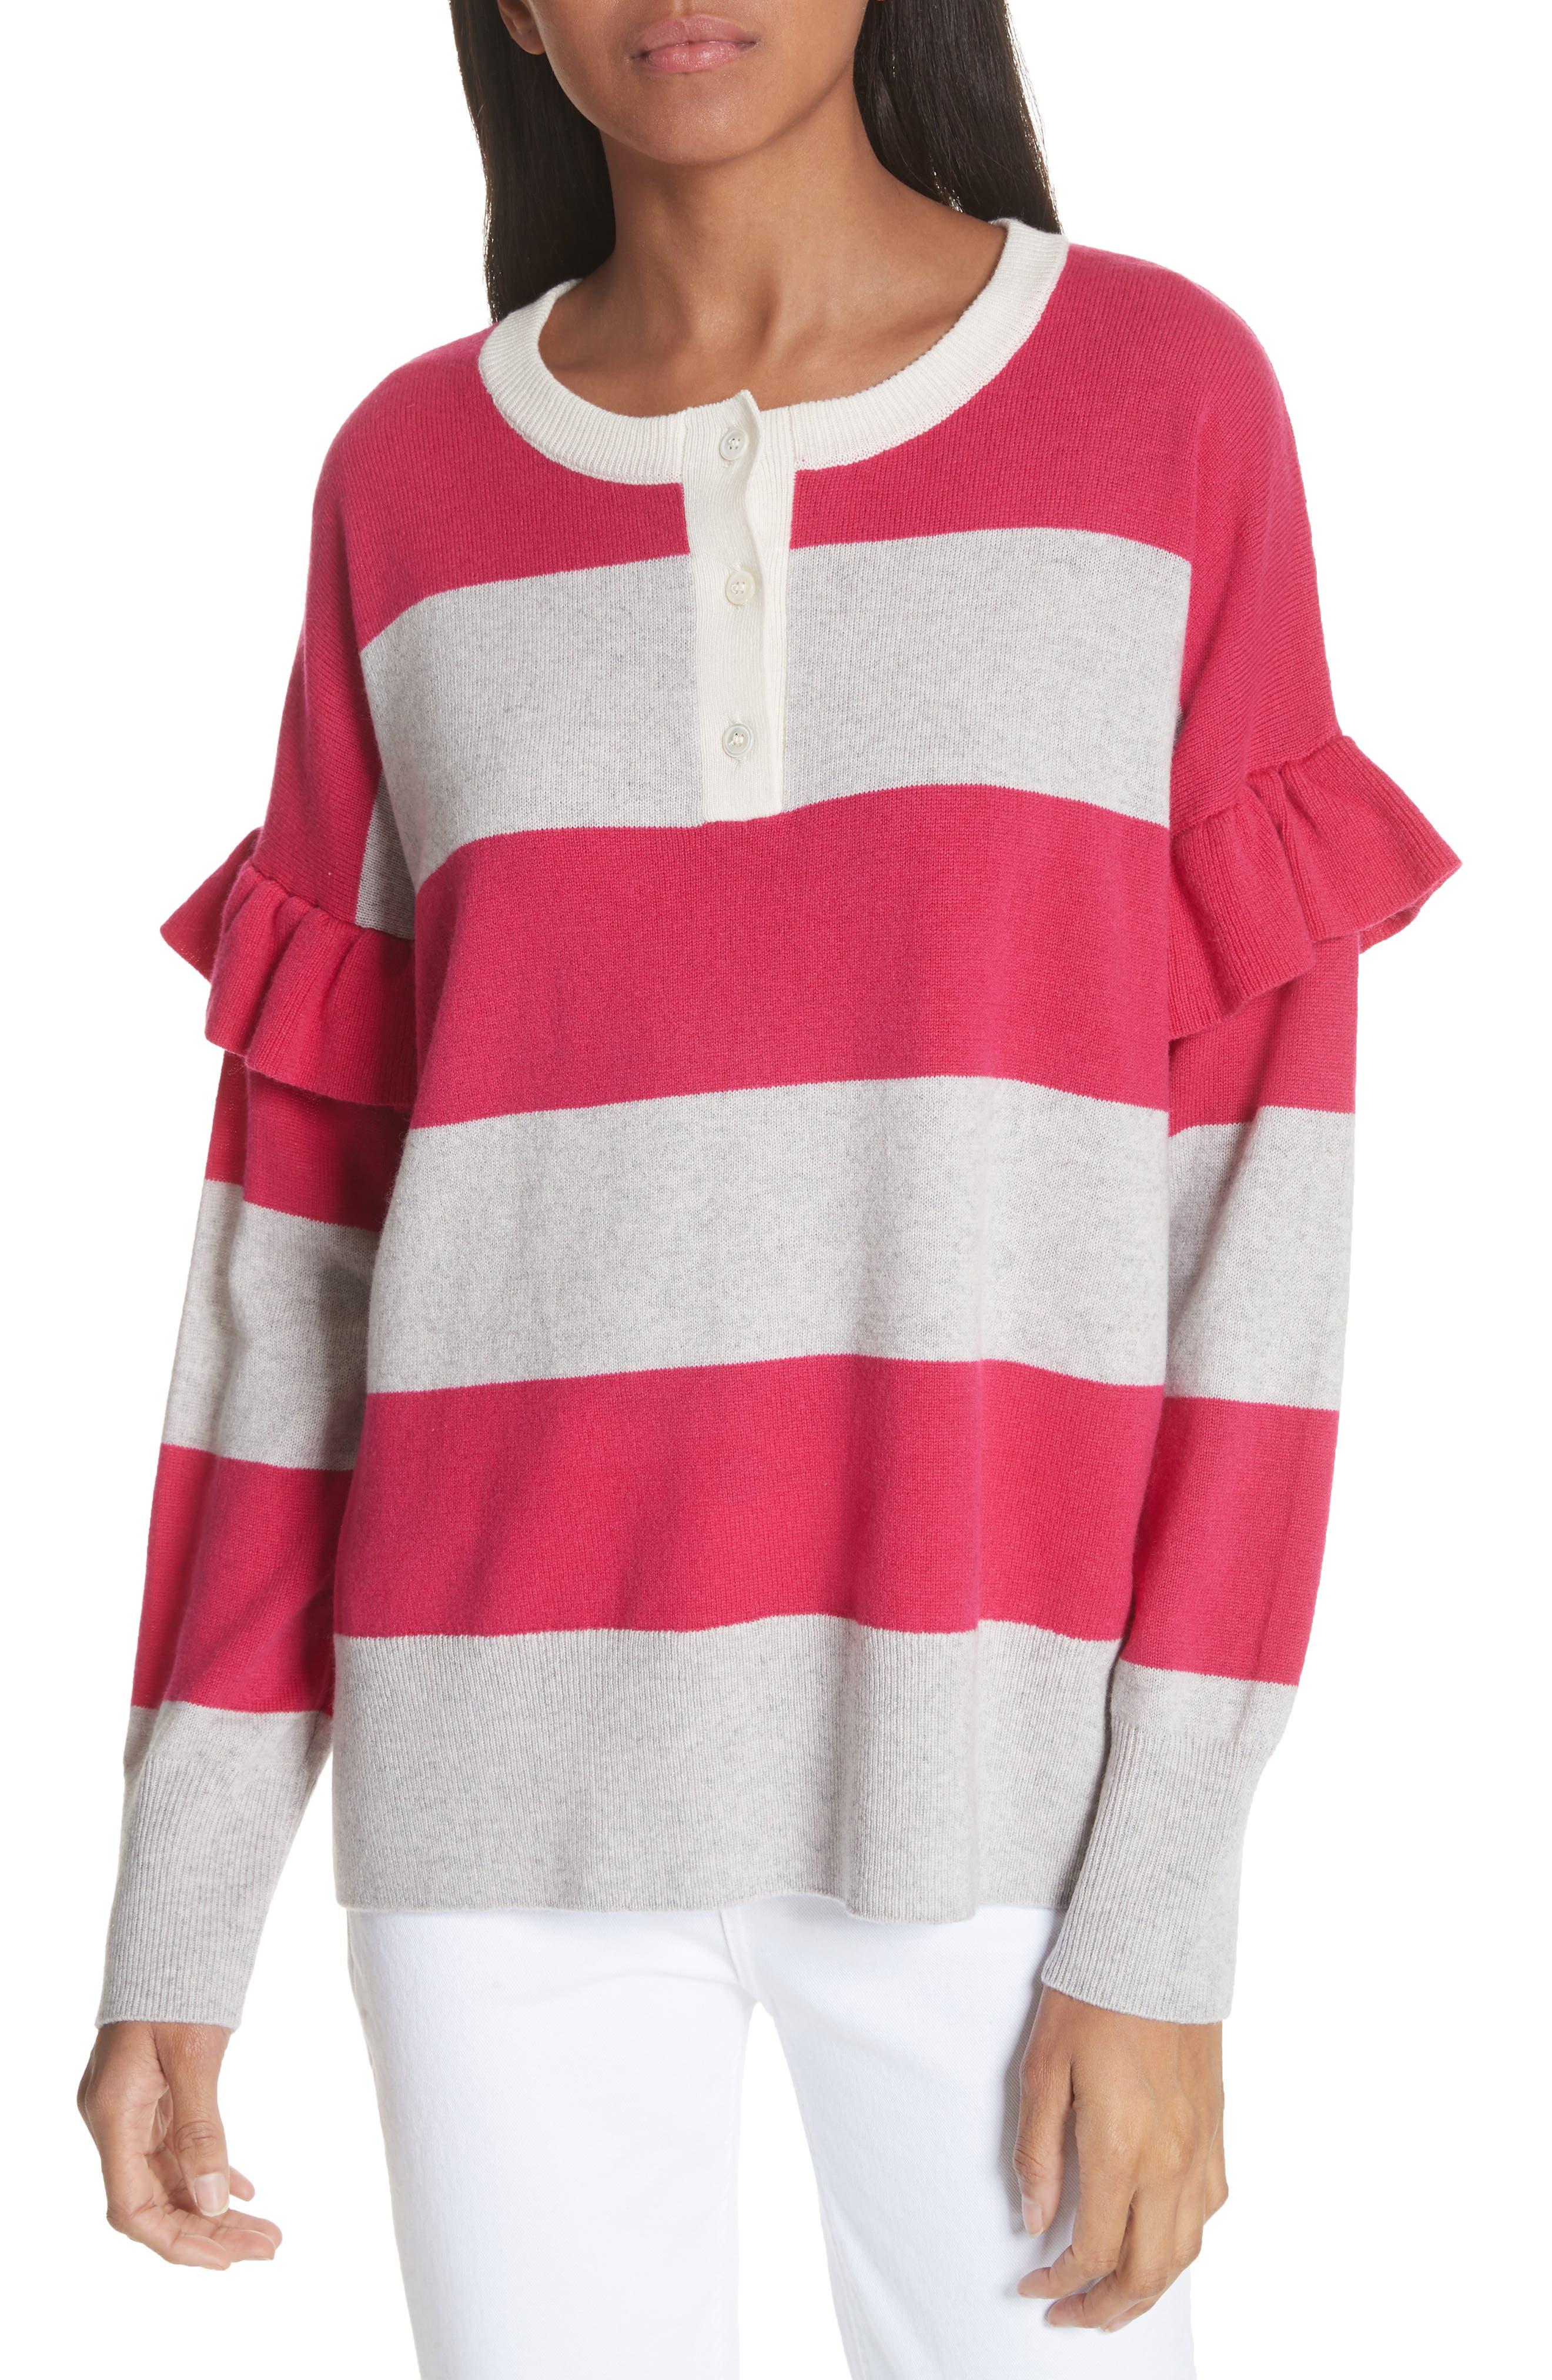 Inghin Stripe Wool & Cashmere Sweater,                             Main thumbnail 1, color,                             Hacienda/ Heather Grey